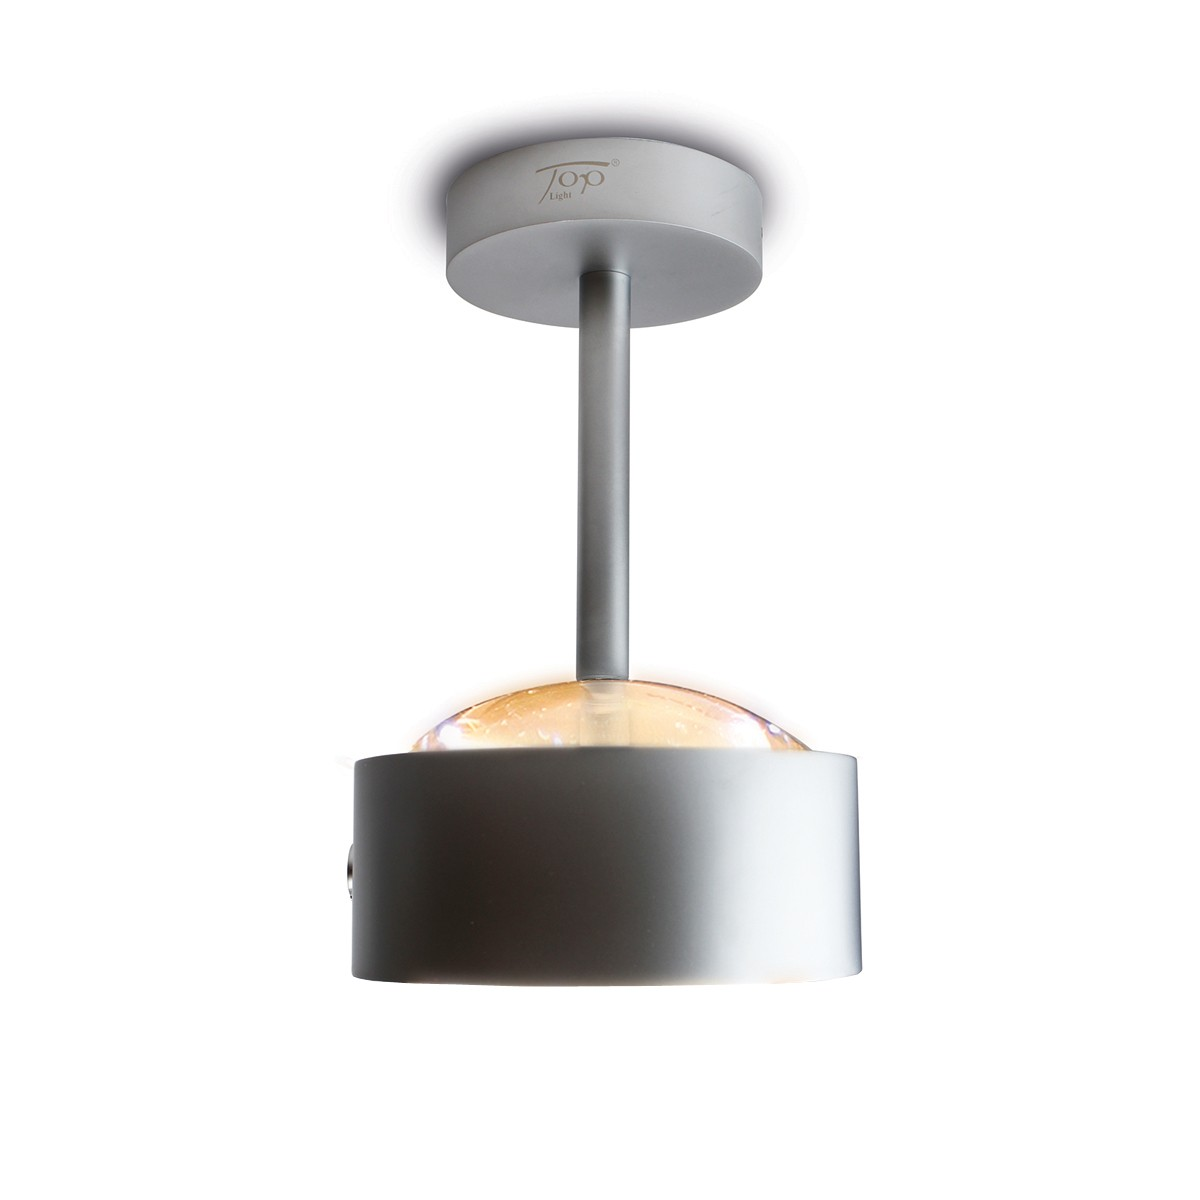 Top Light Puk Maxx Eye Ceiling LED Deckenleuchte, Chrom matt